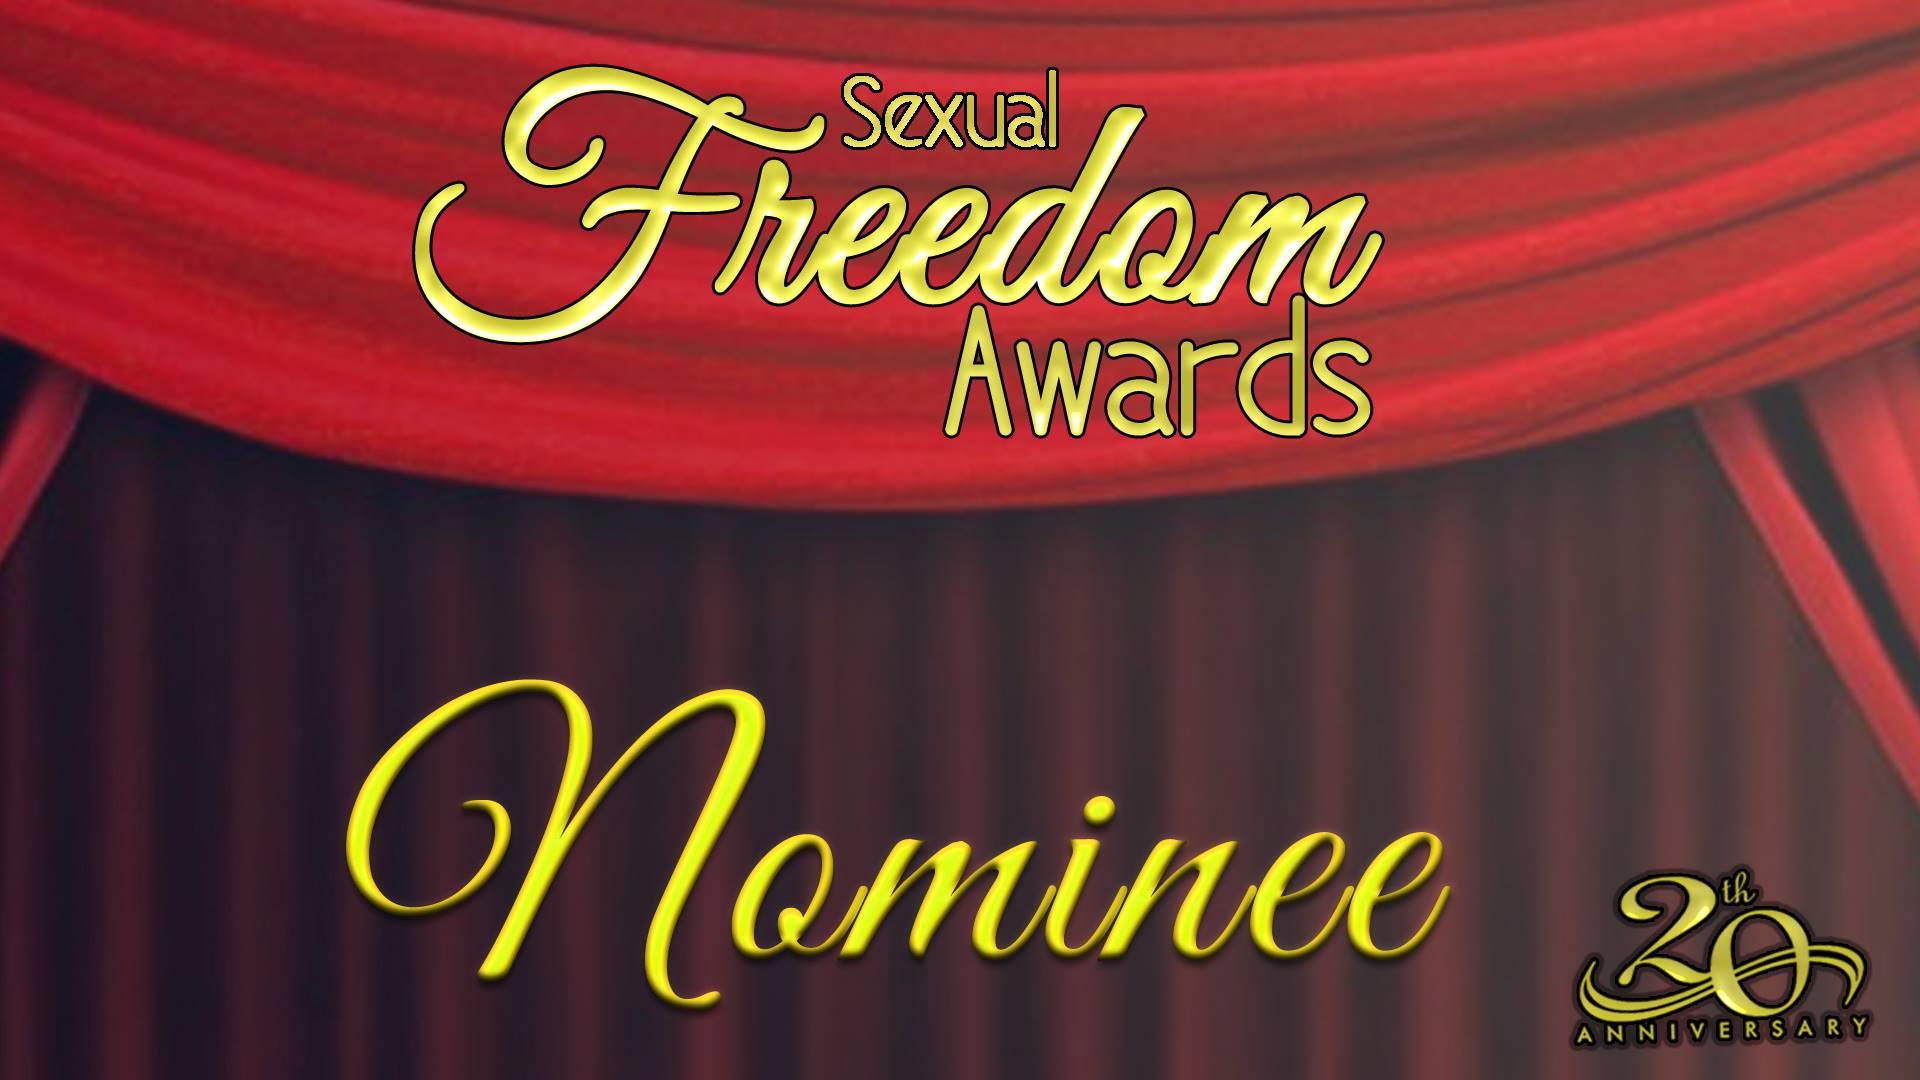 Sexual Freedom Awards Logo